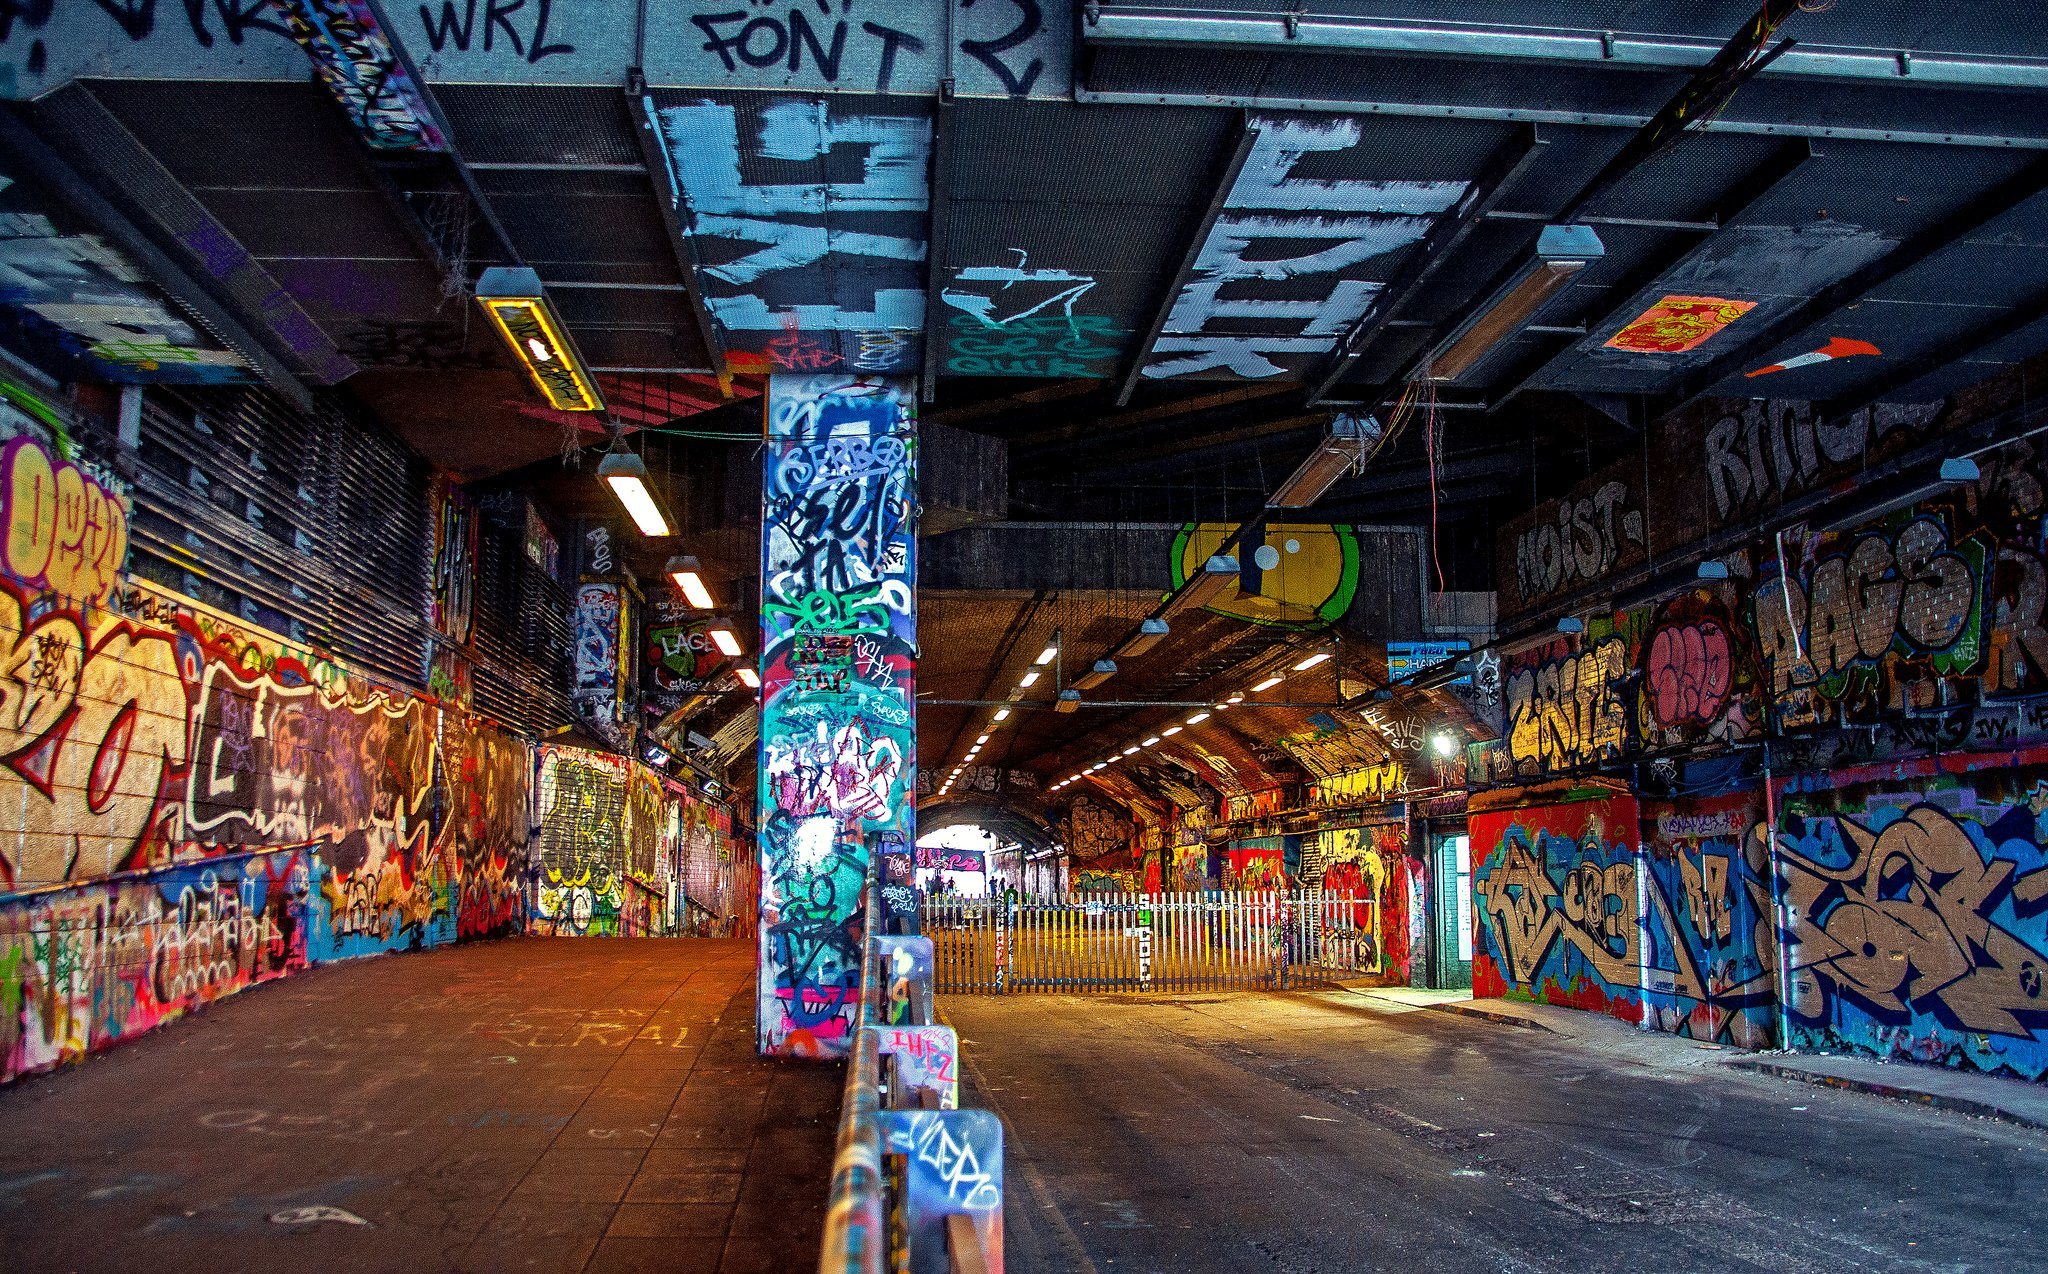 leake street graffiti tunnel london